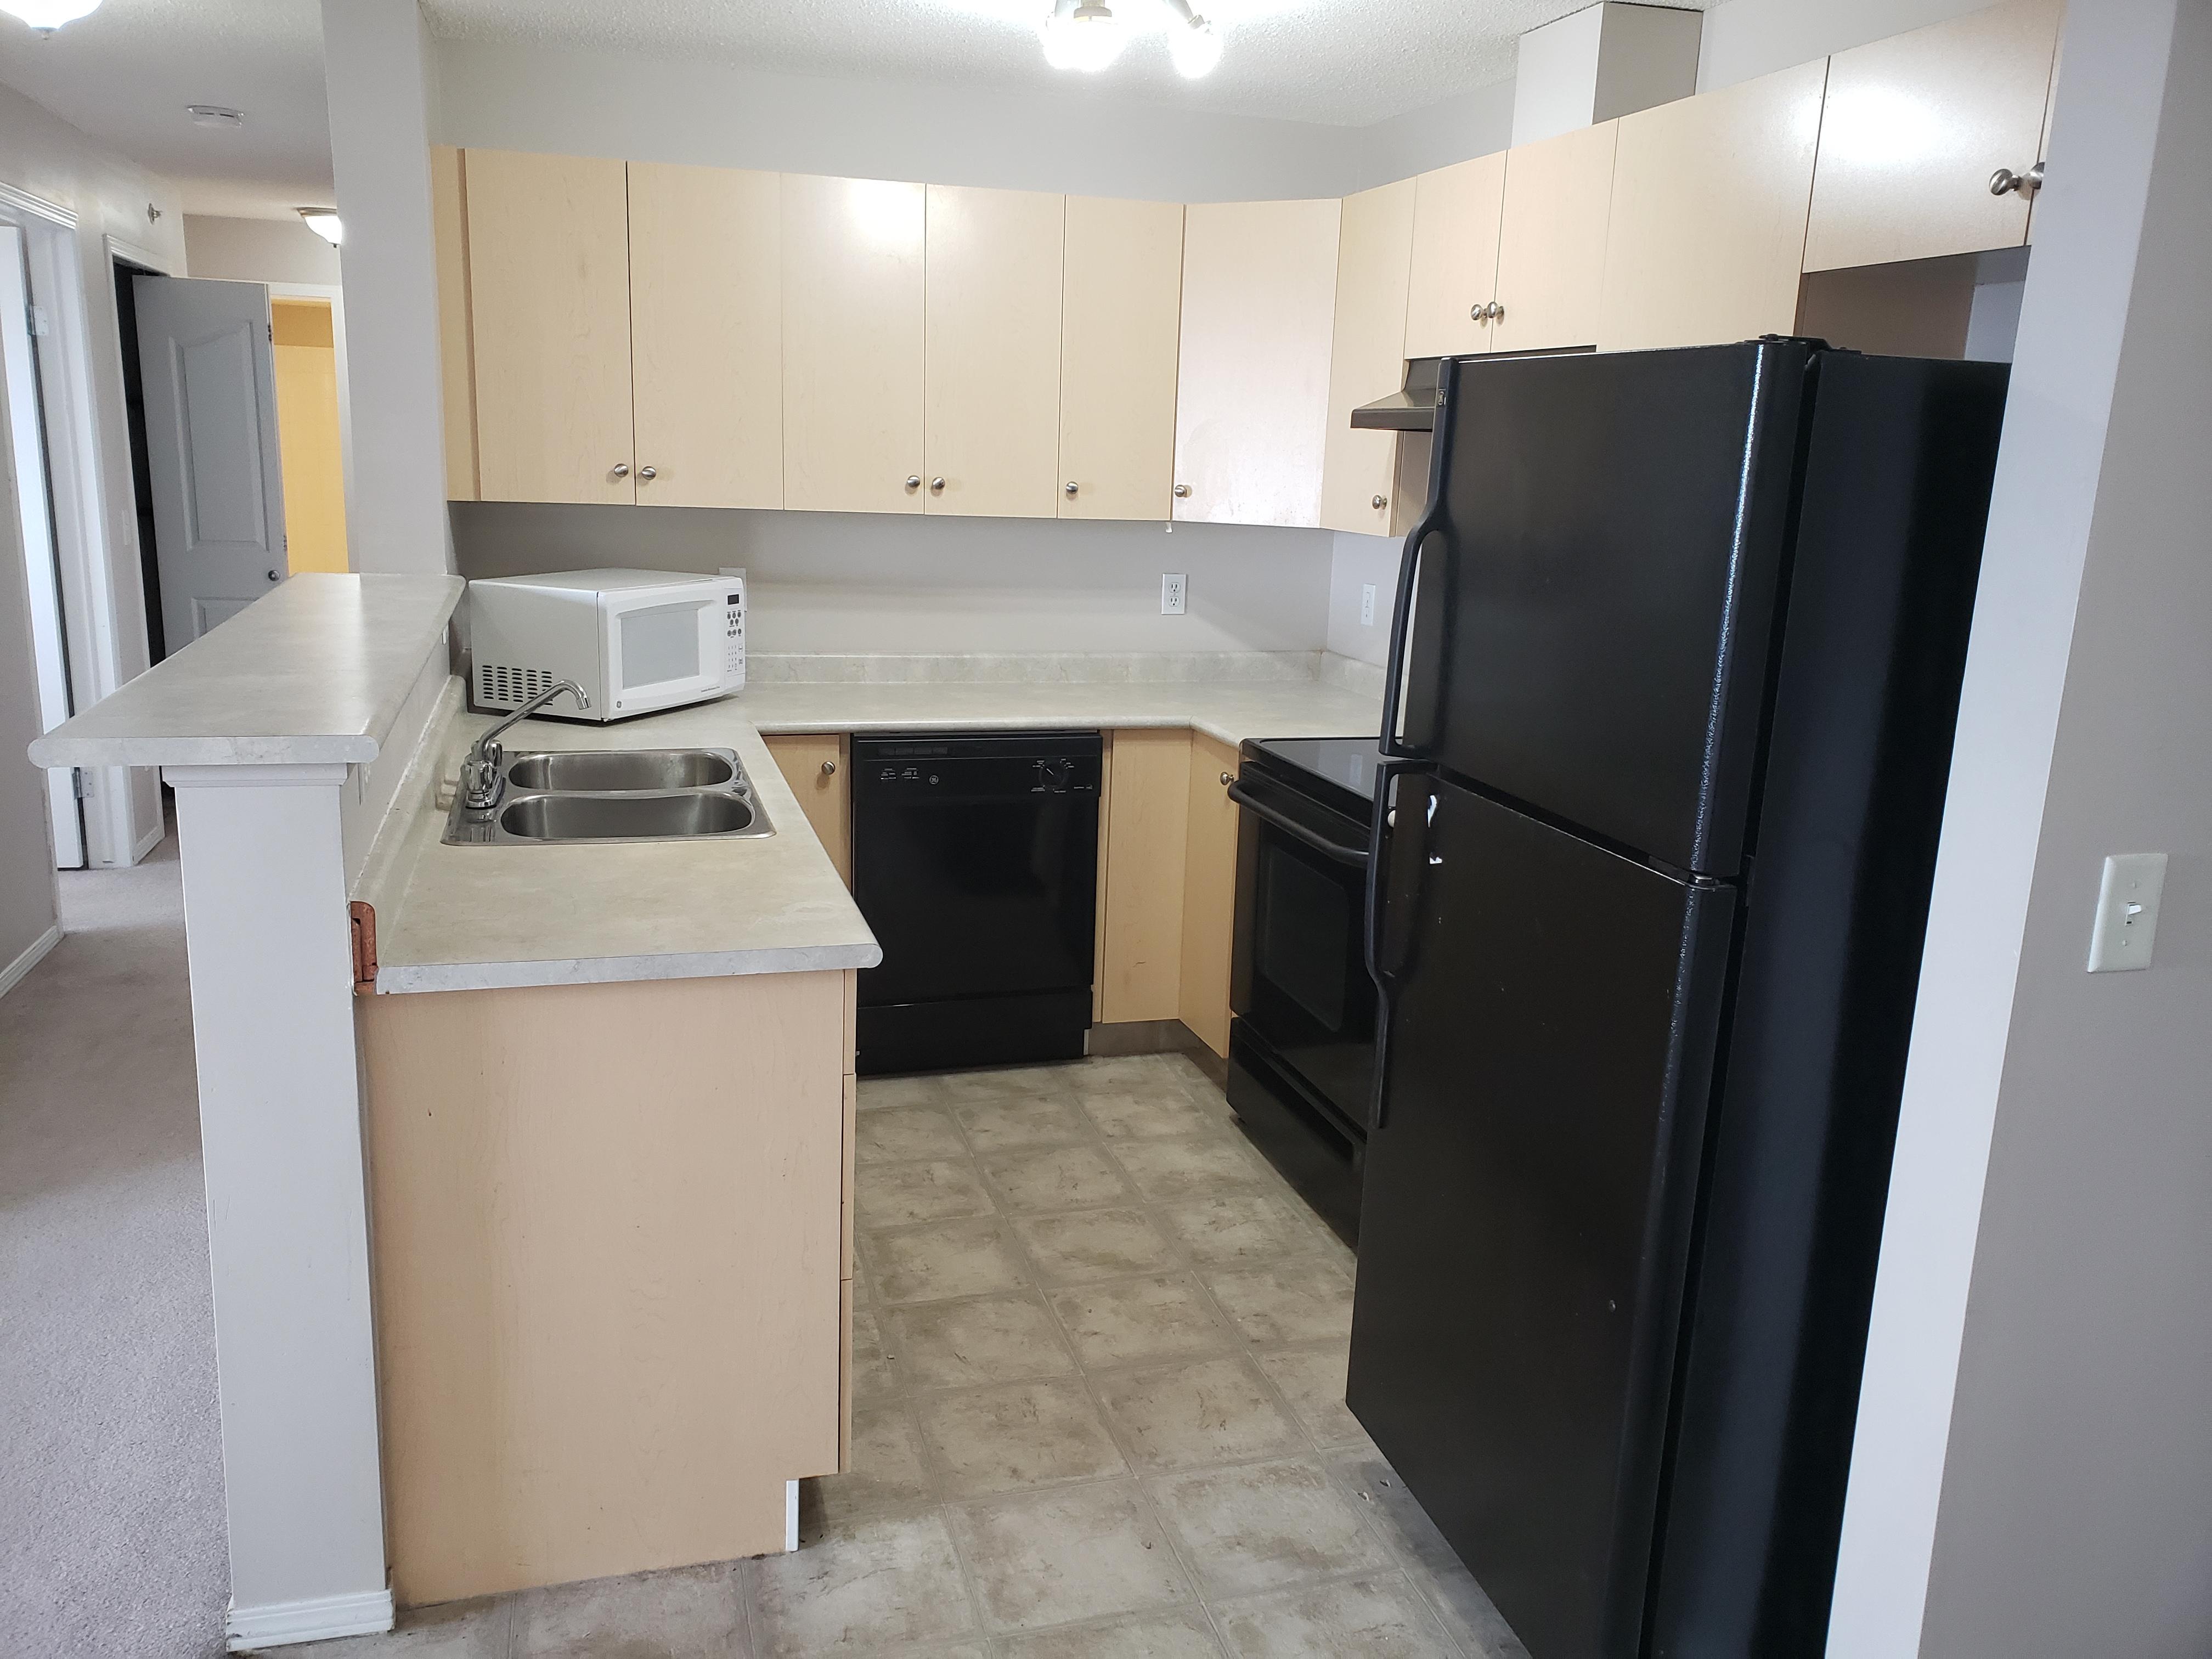 10 Prestwick Bay SE, Calgary, Alberta T3P 0B1, 2 Bedrooms Bedrooms, ,2 BathroomsBathrooms,Apartment,For Rent,Prestwick Bay SE,3414,1081